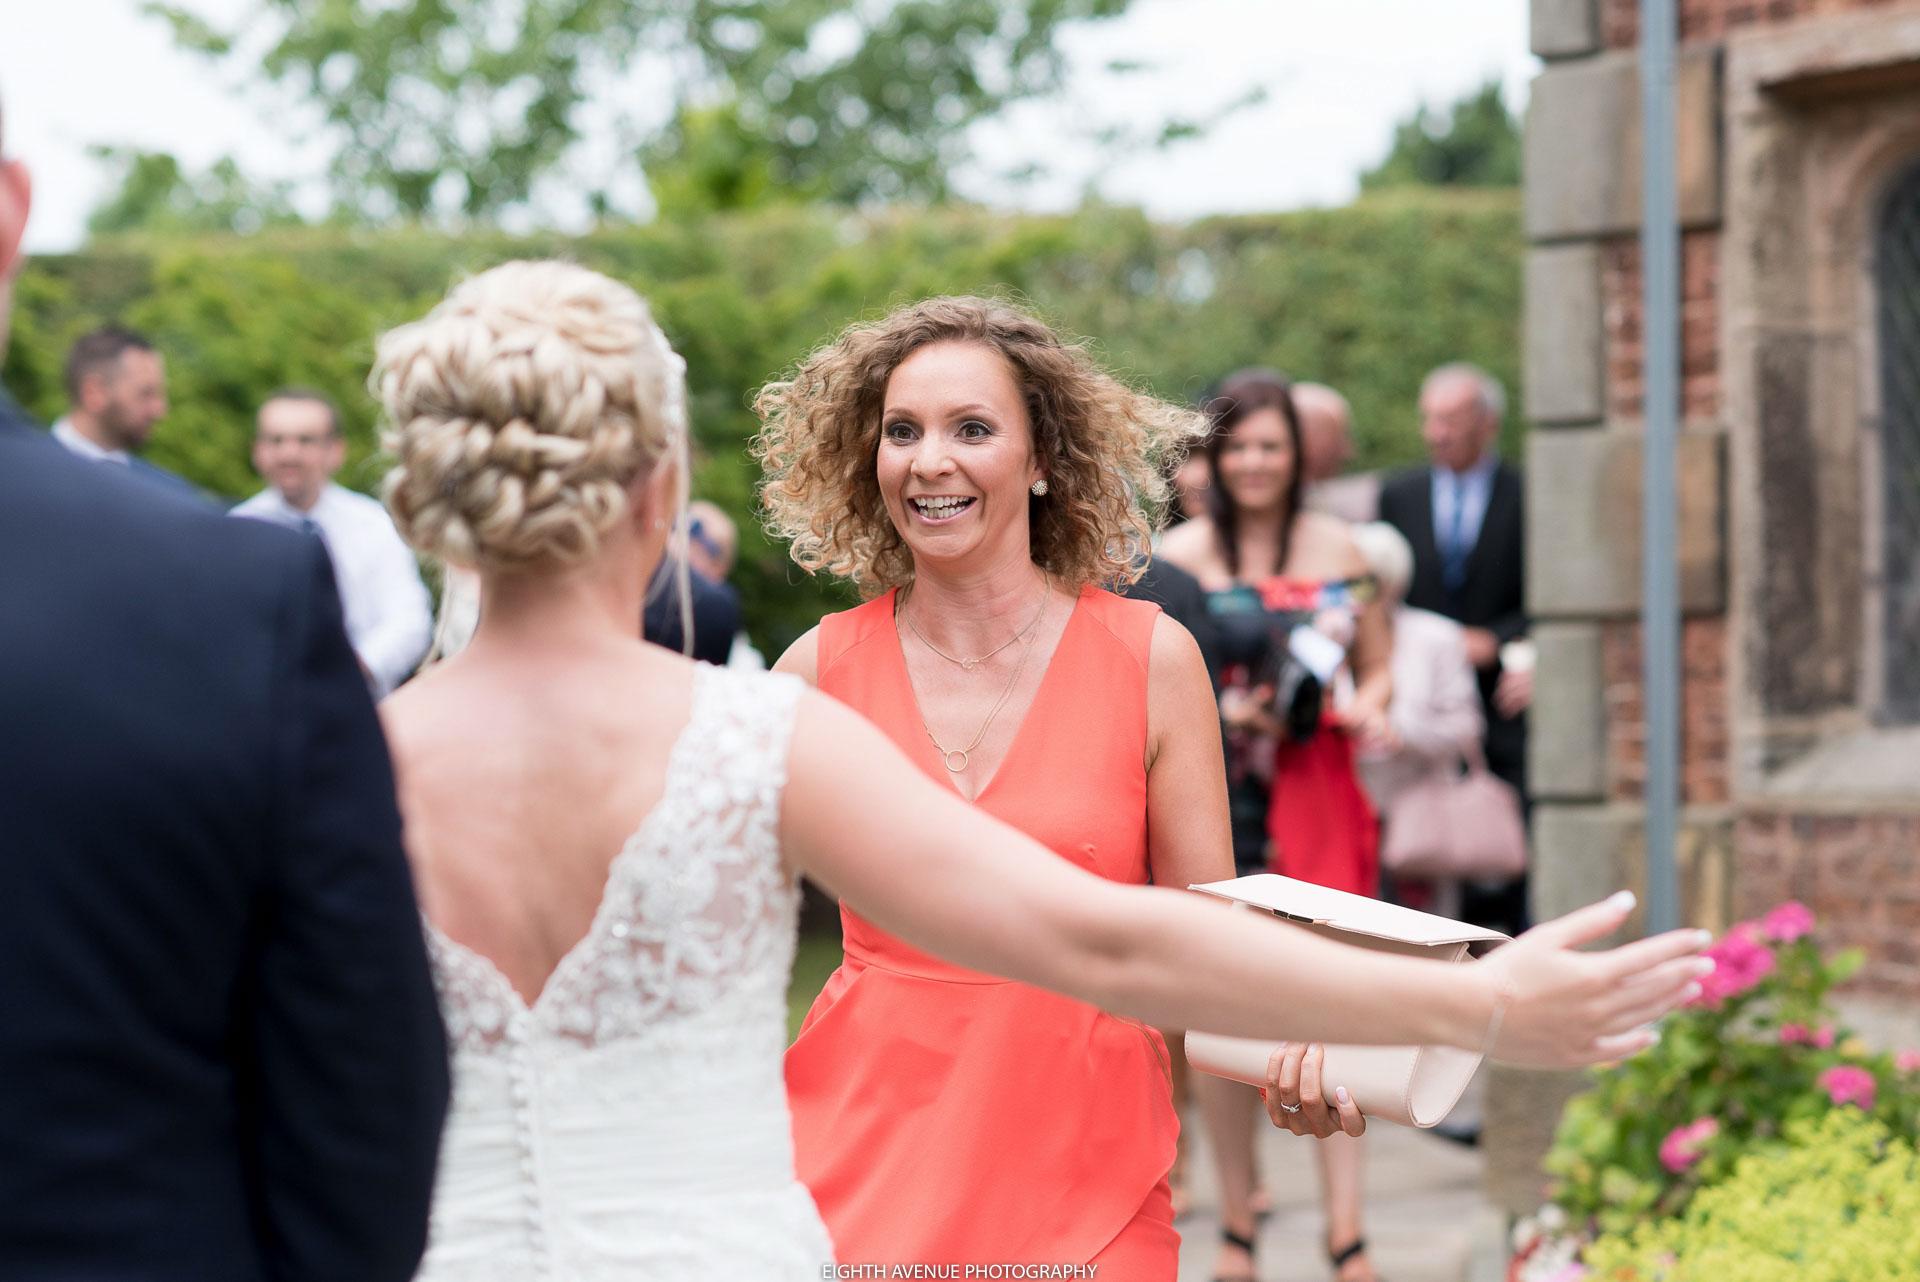 Bride meeting wedding guest outside church